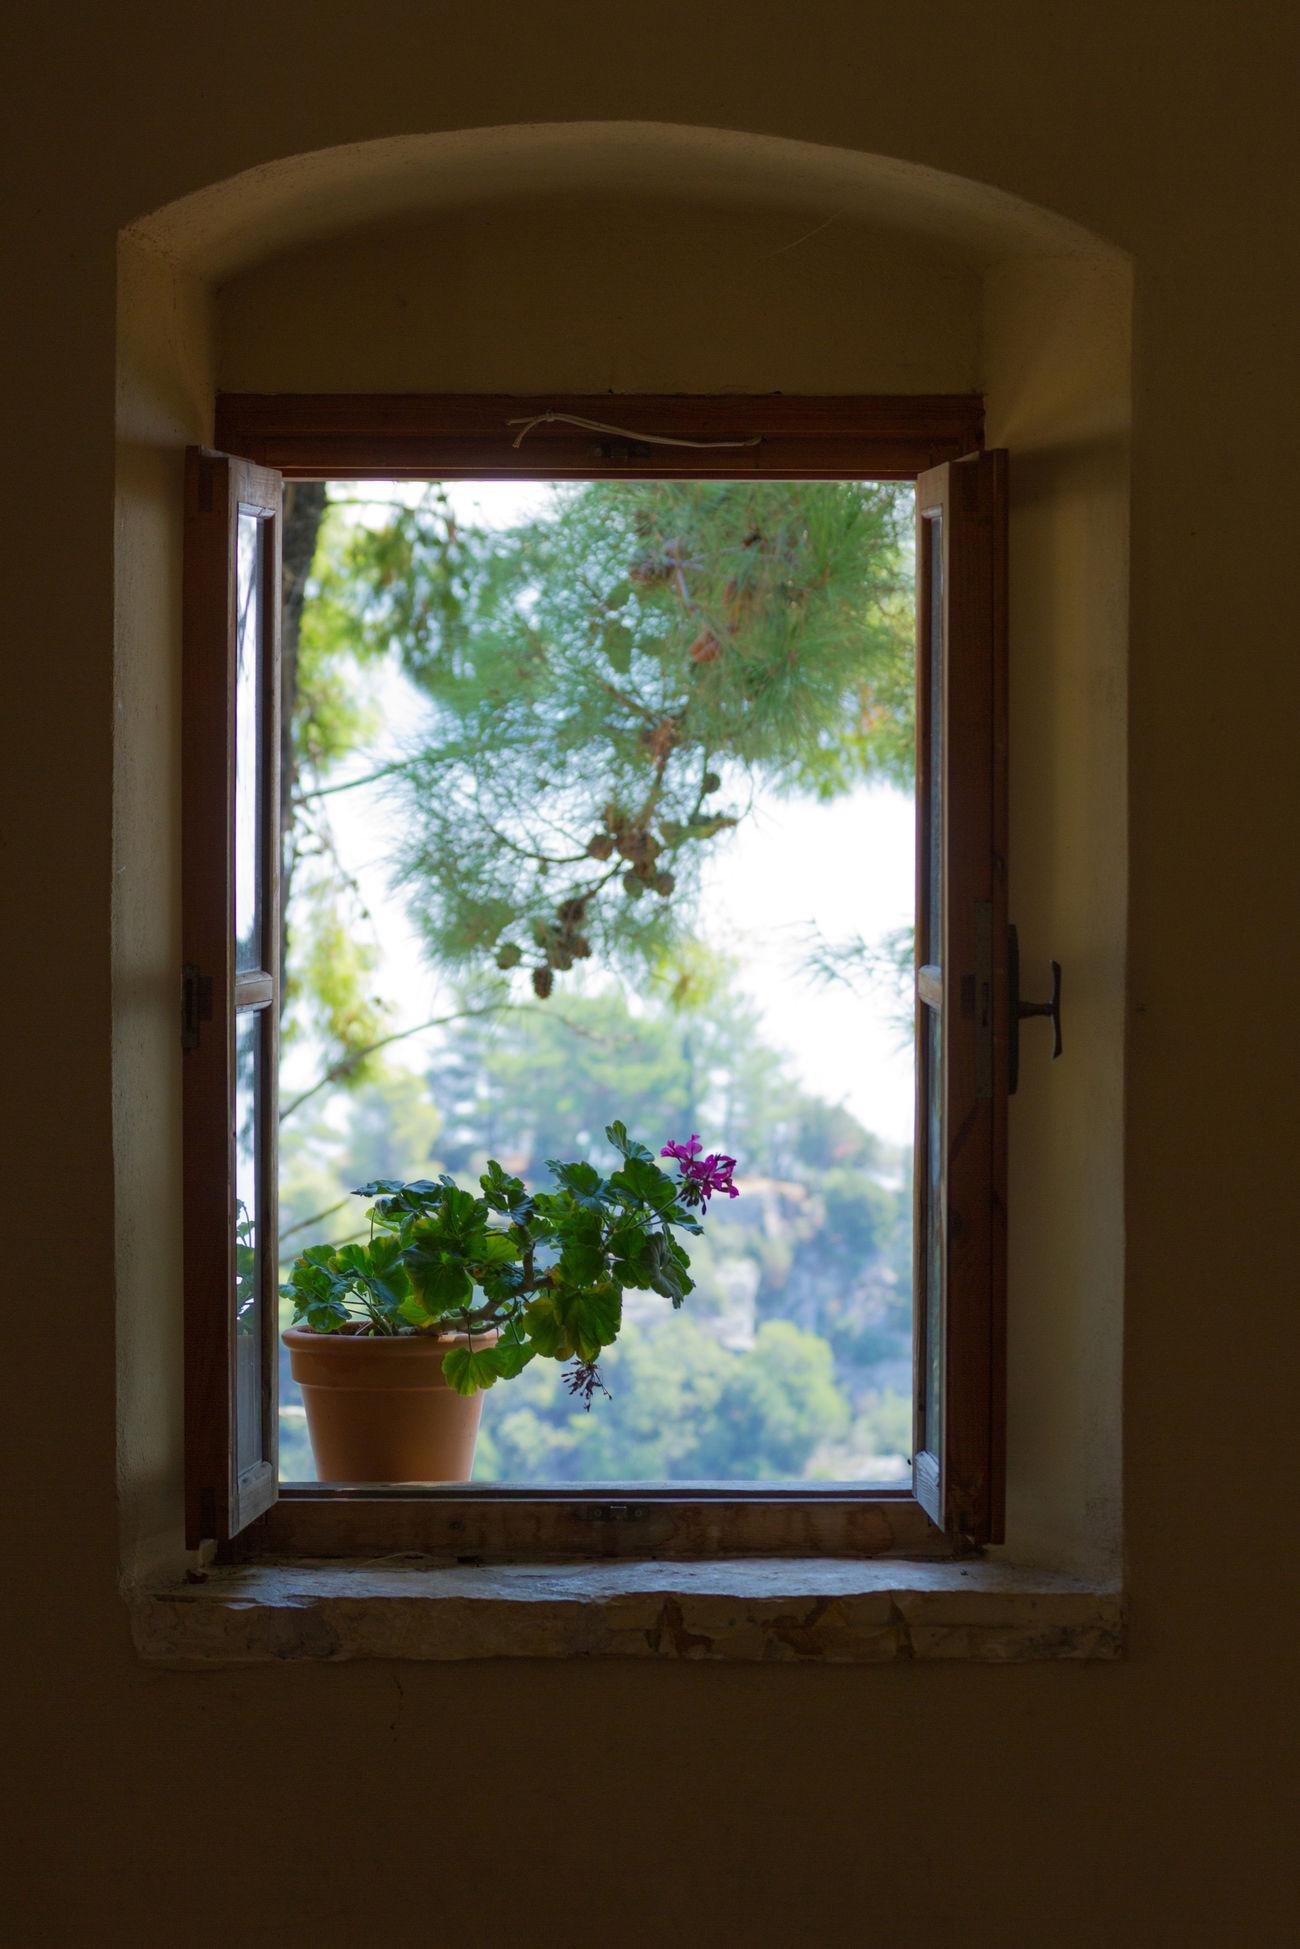 Flower Framed Greece Holiday Plant Portrait Window Window View